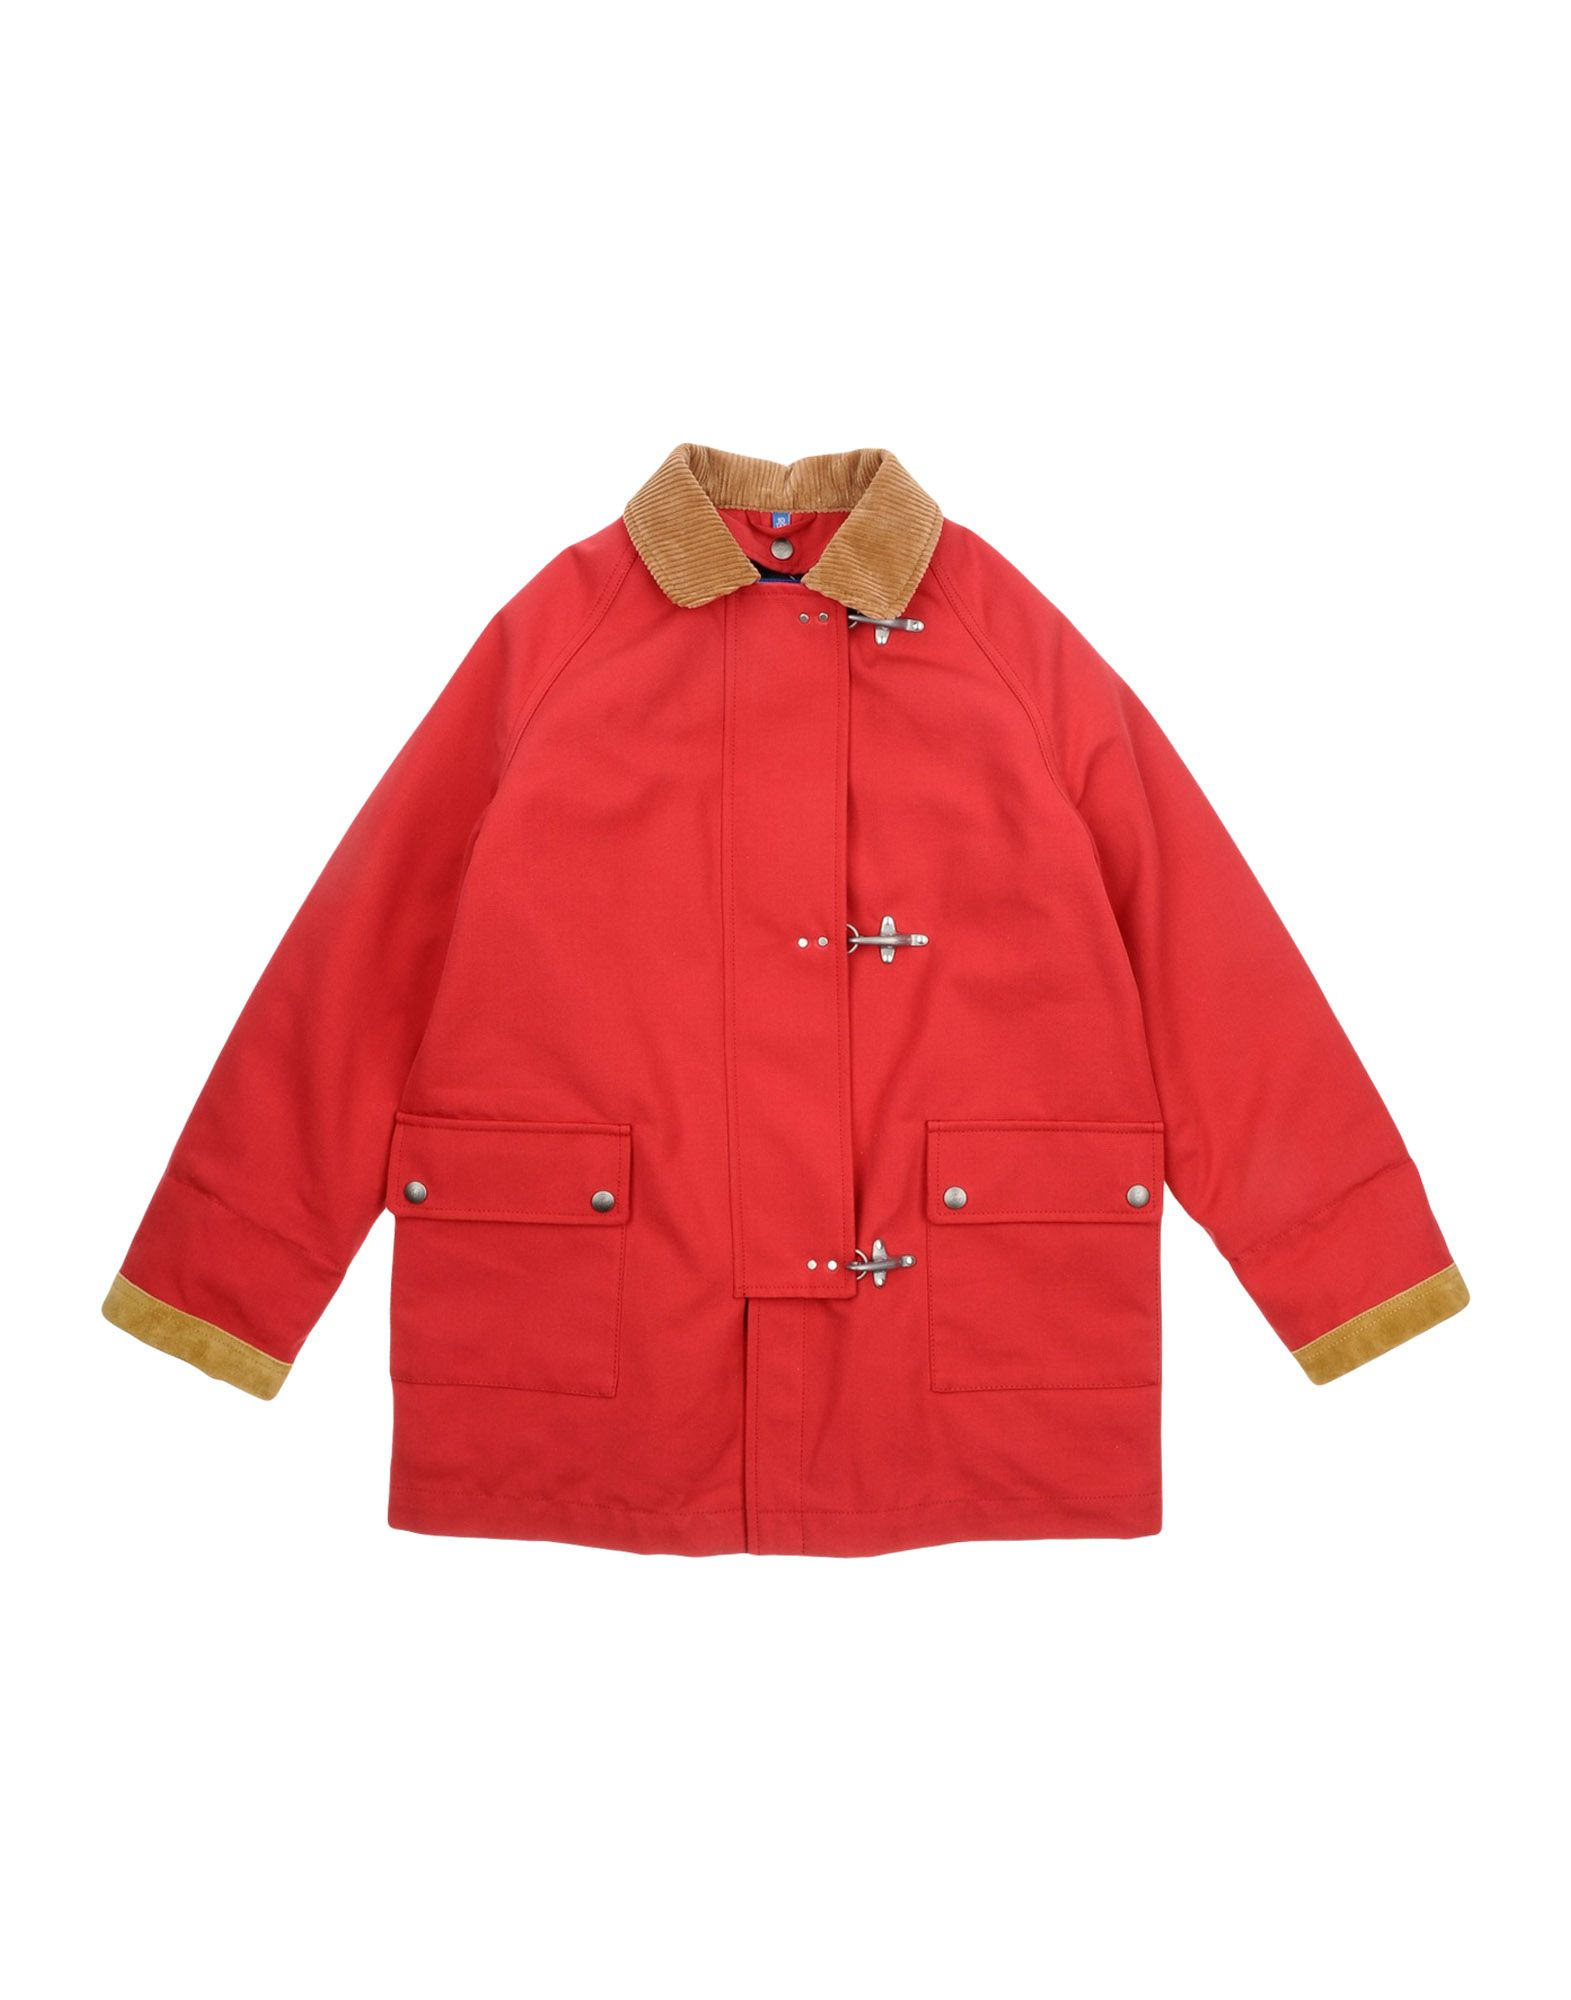 FAY Mädchen 9-16 jahre Mantel2 rot